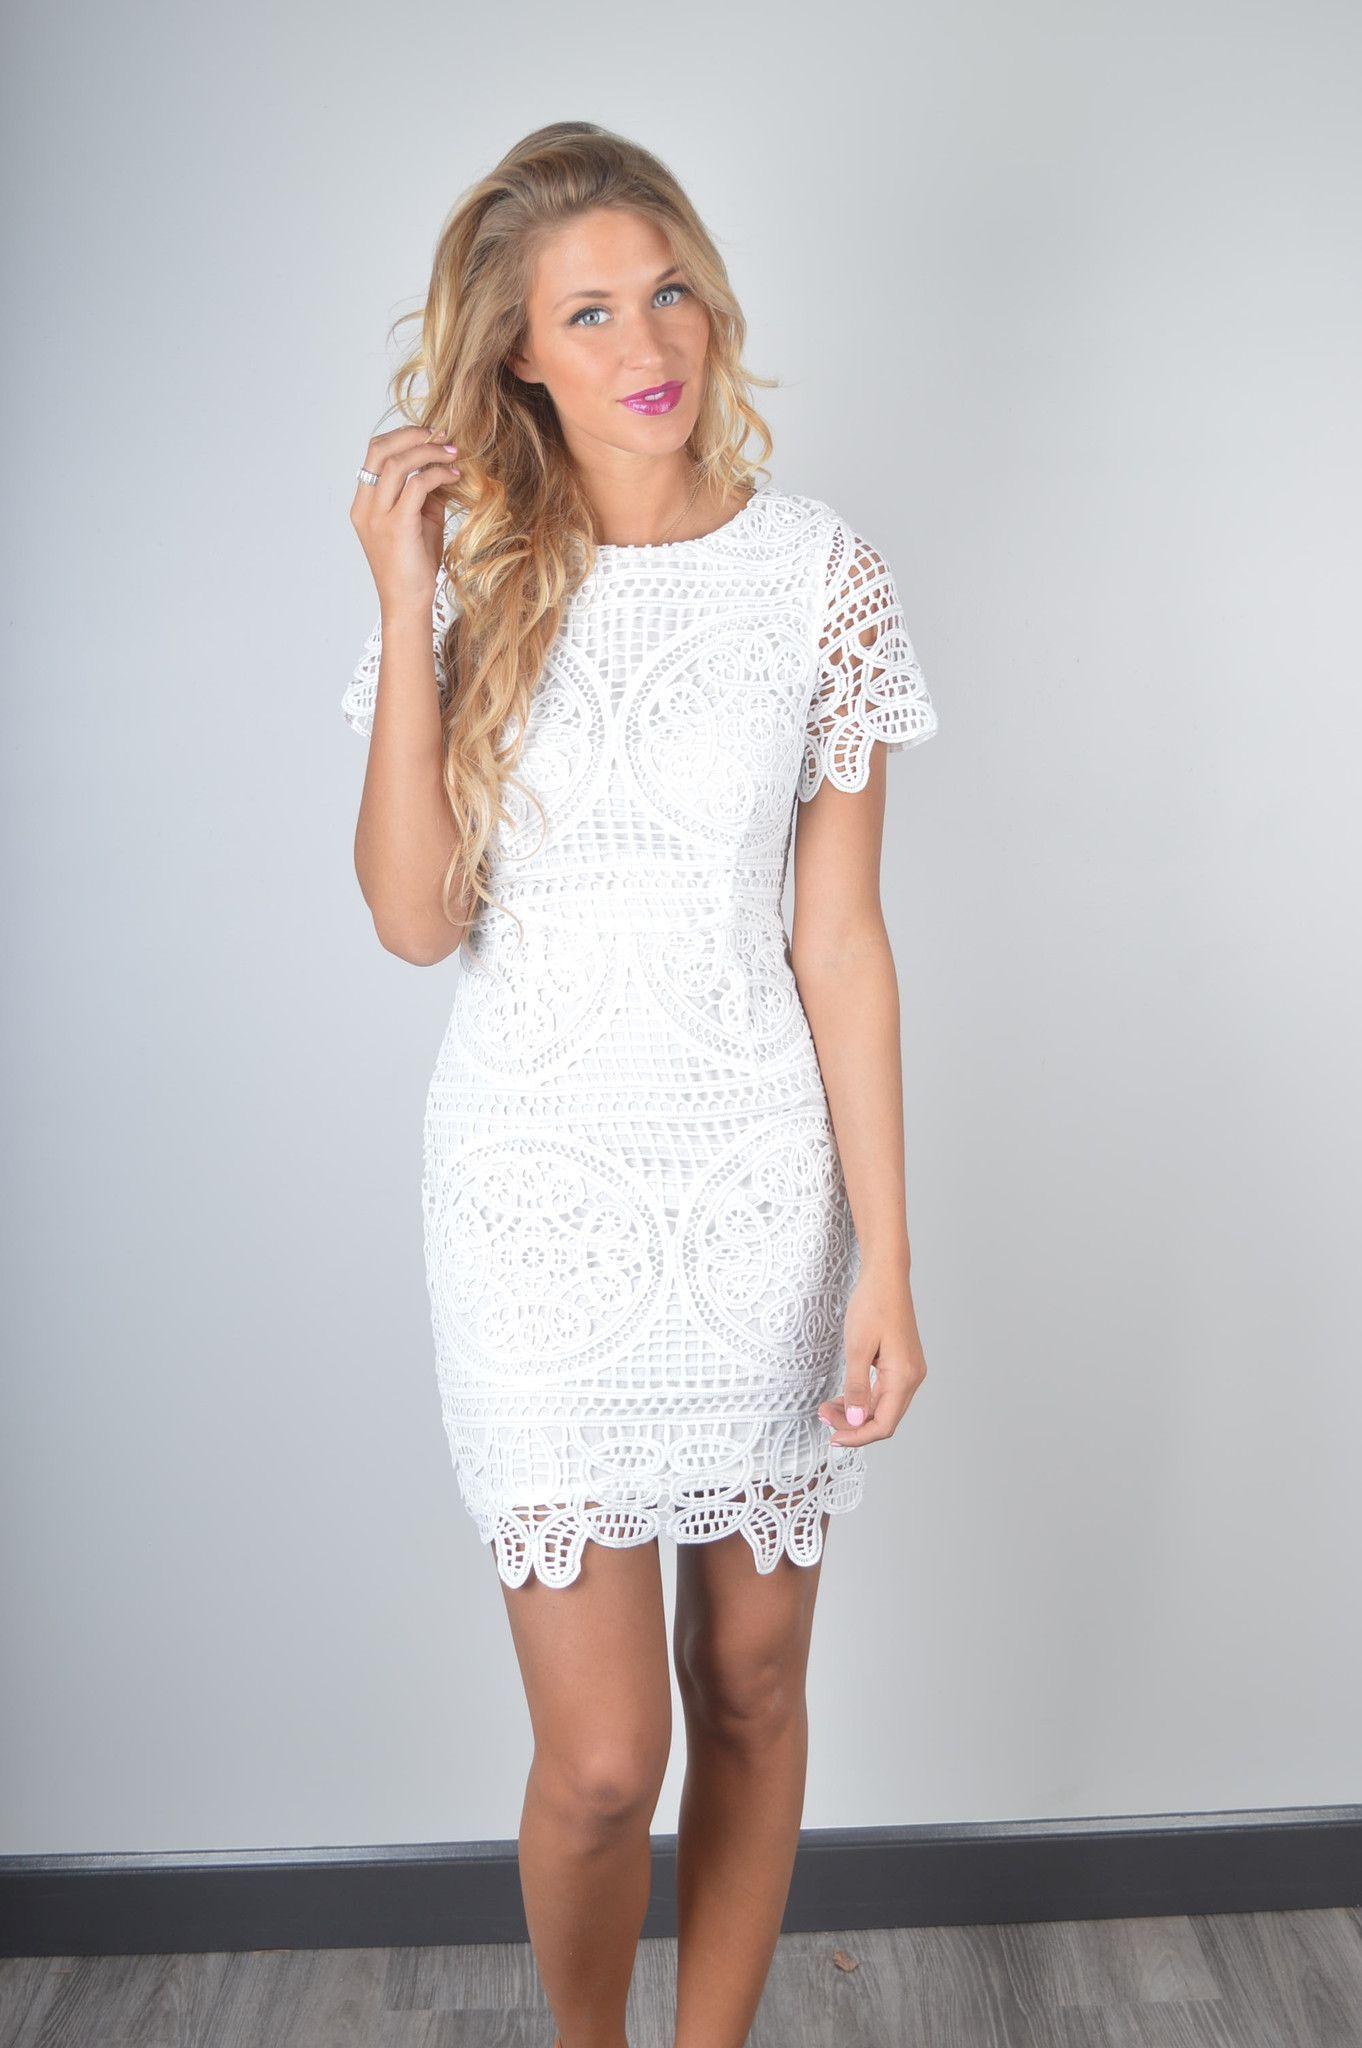 J.O.A. White Crochet Dress | Foi Clothing | Bridal Shower Dress ...